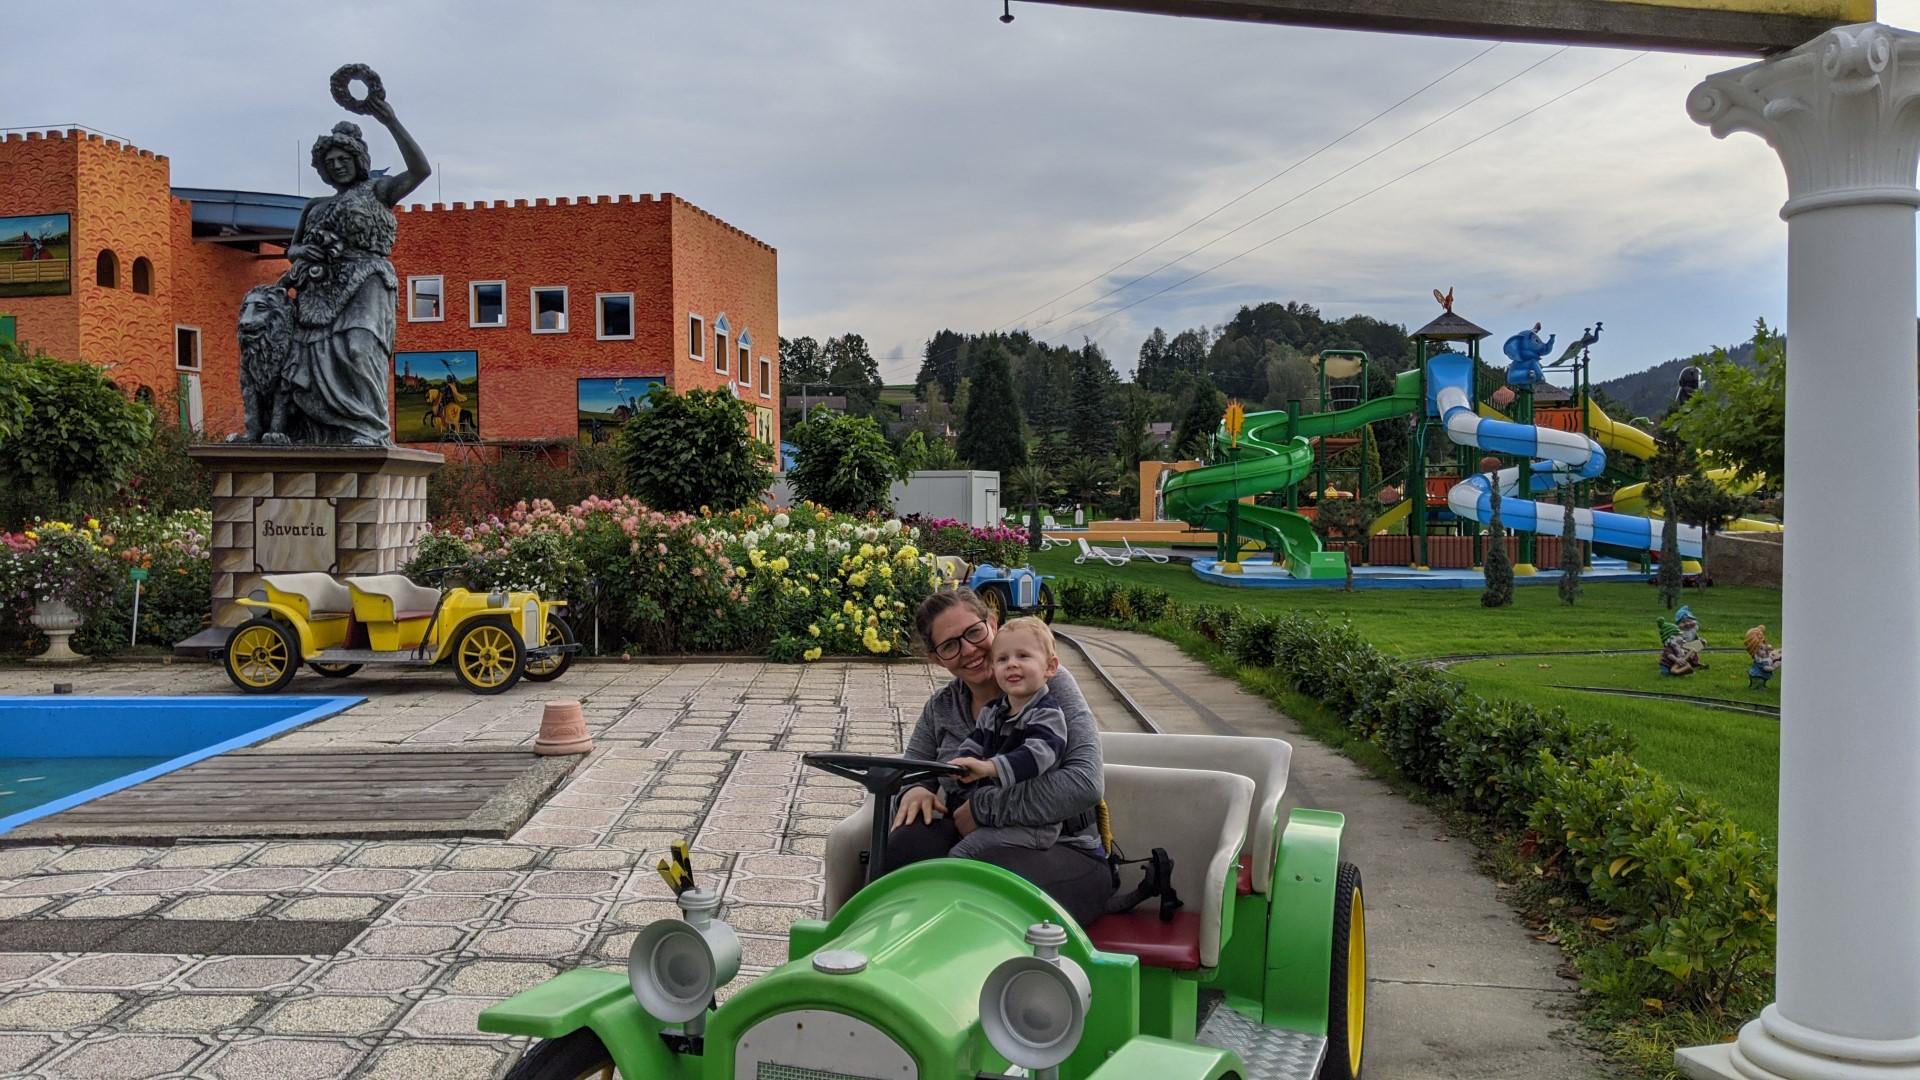 Amusement parks for kids in germany Churpfalz Park